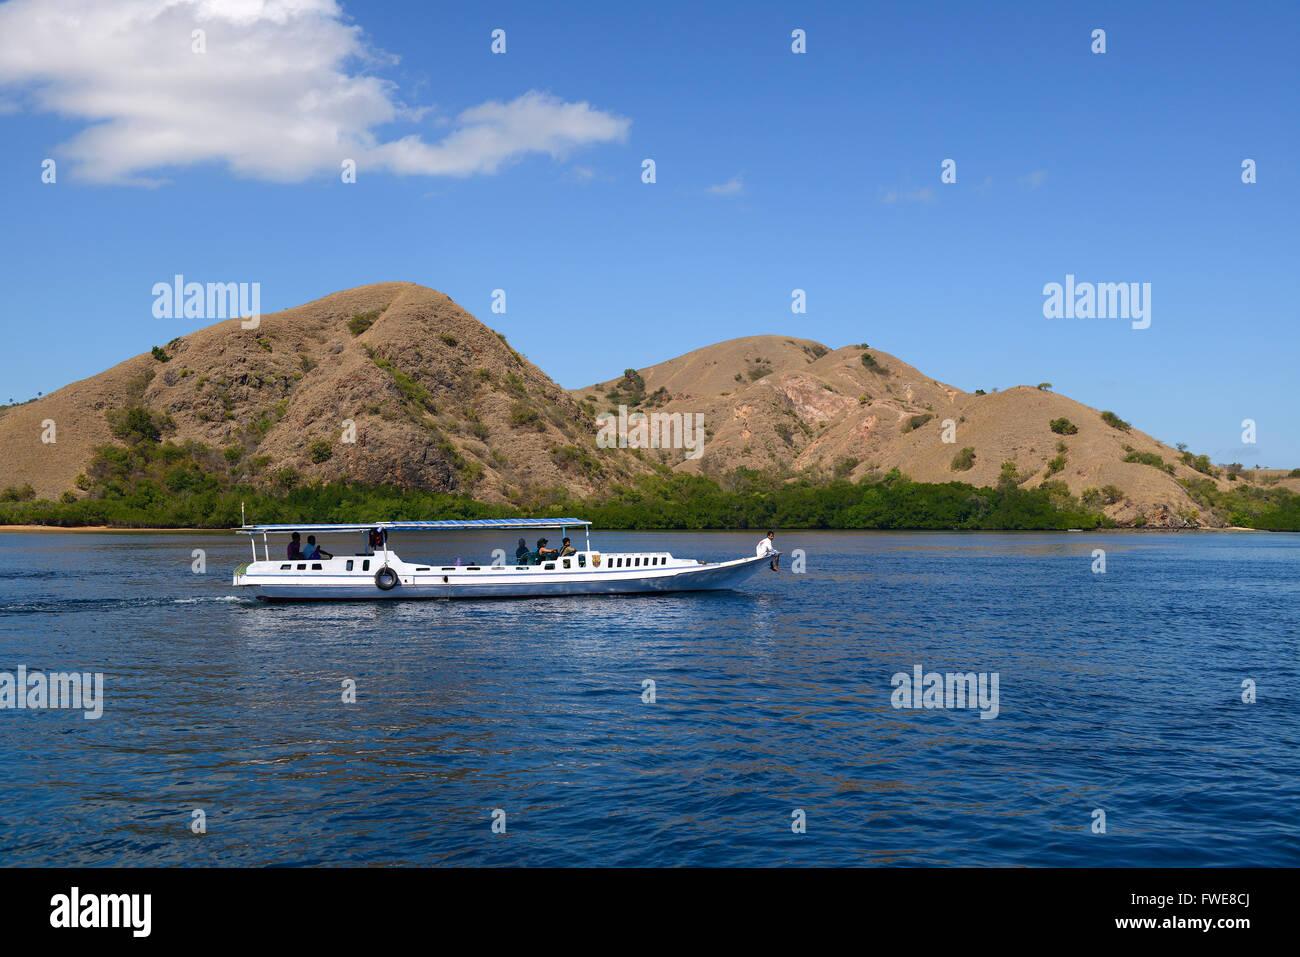 Typical tourist ship anchoring off Rinca Island, Komodo National Park, UNESCO World Heritage Site, Indonesia - Stock Image